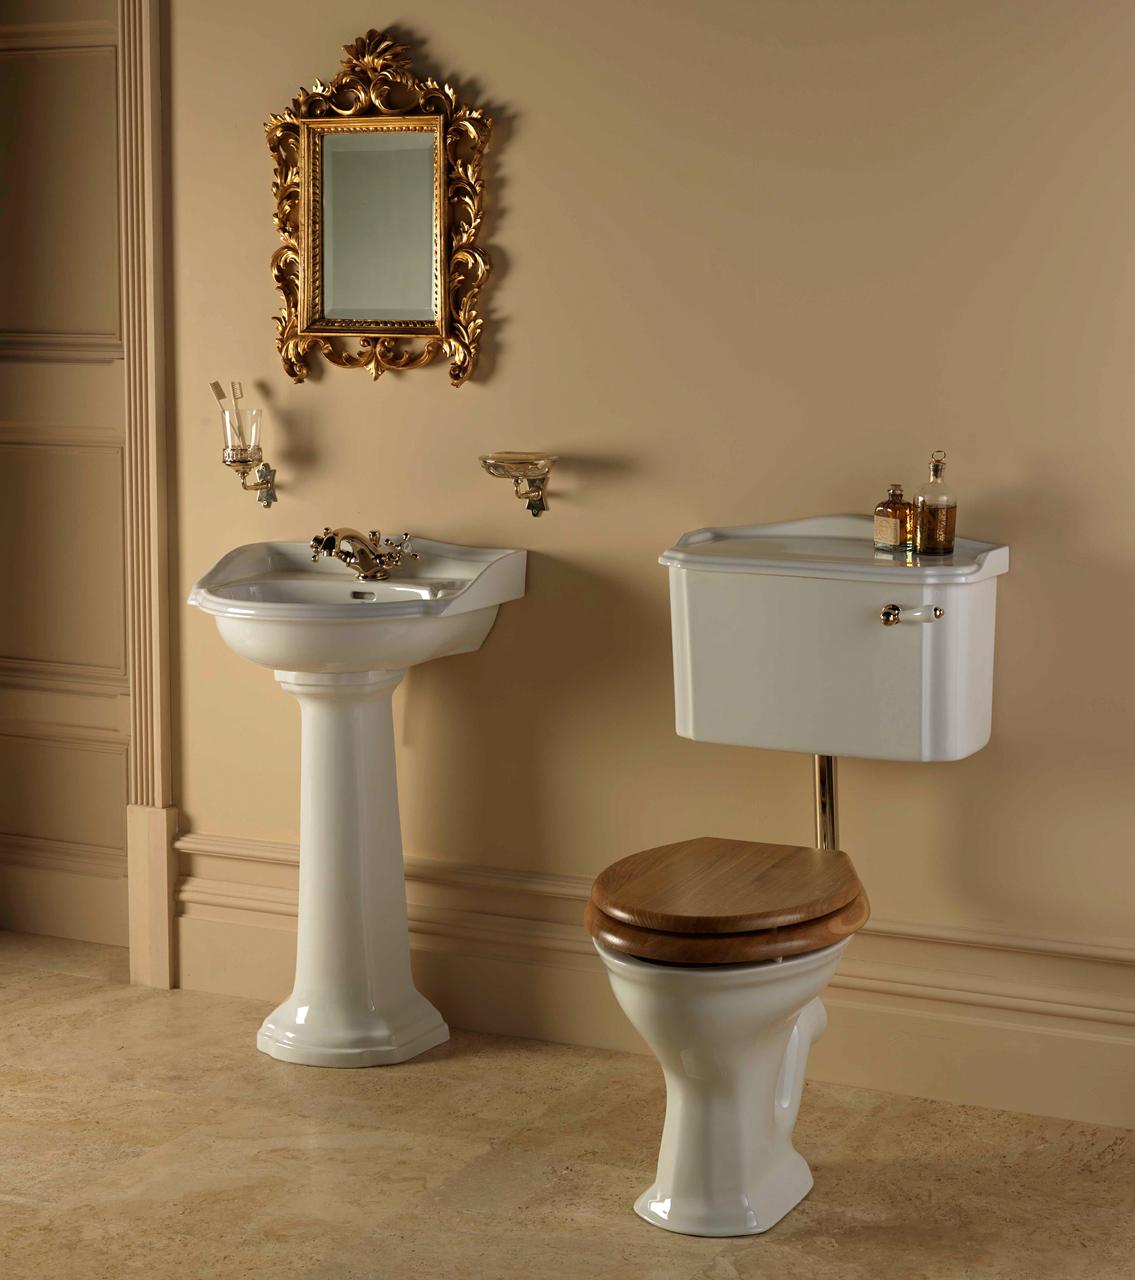 Classic Bathrooms: Imperial Bathrooms - Heyford-Cloakroom